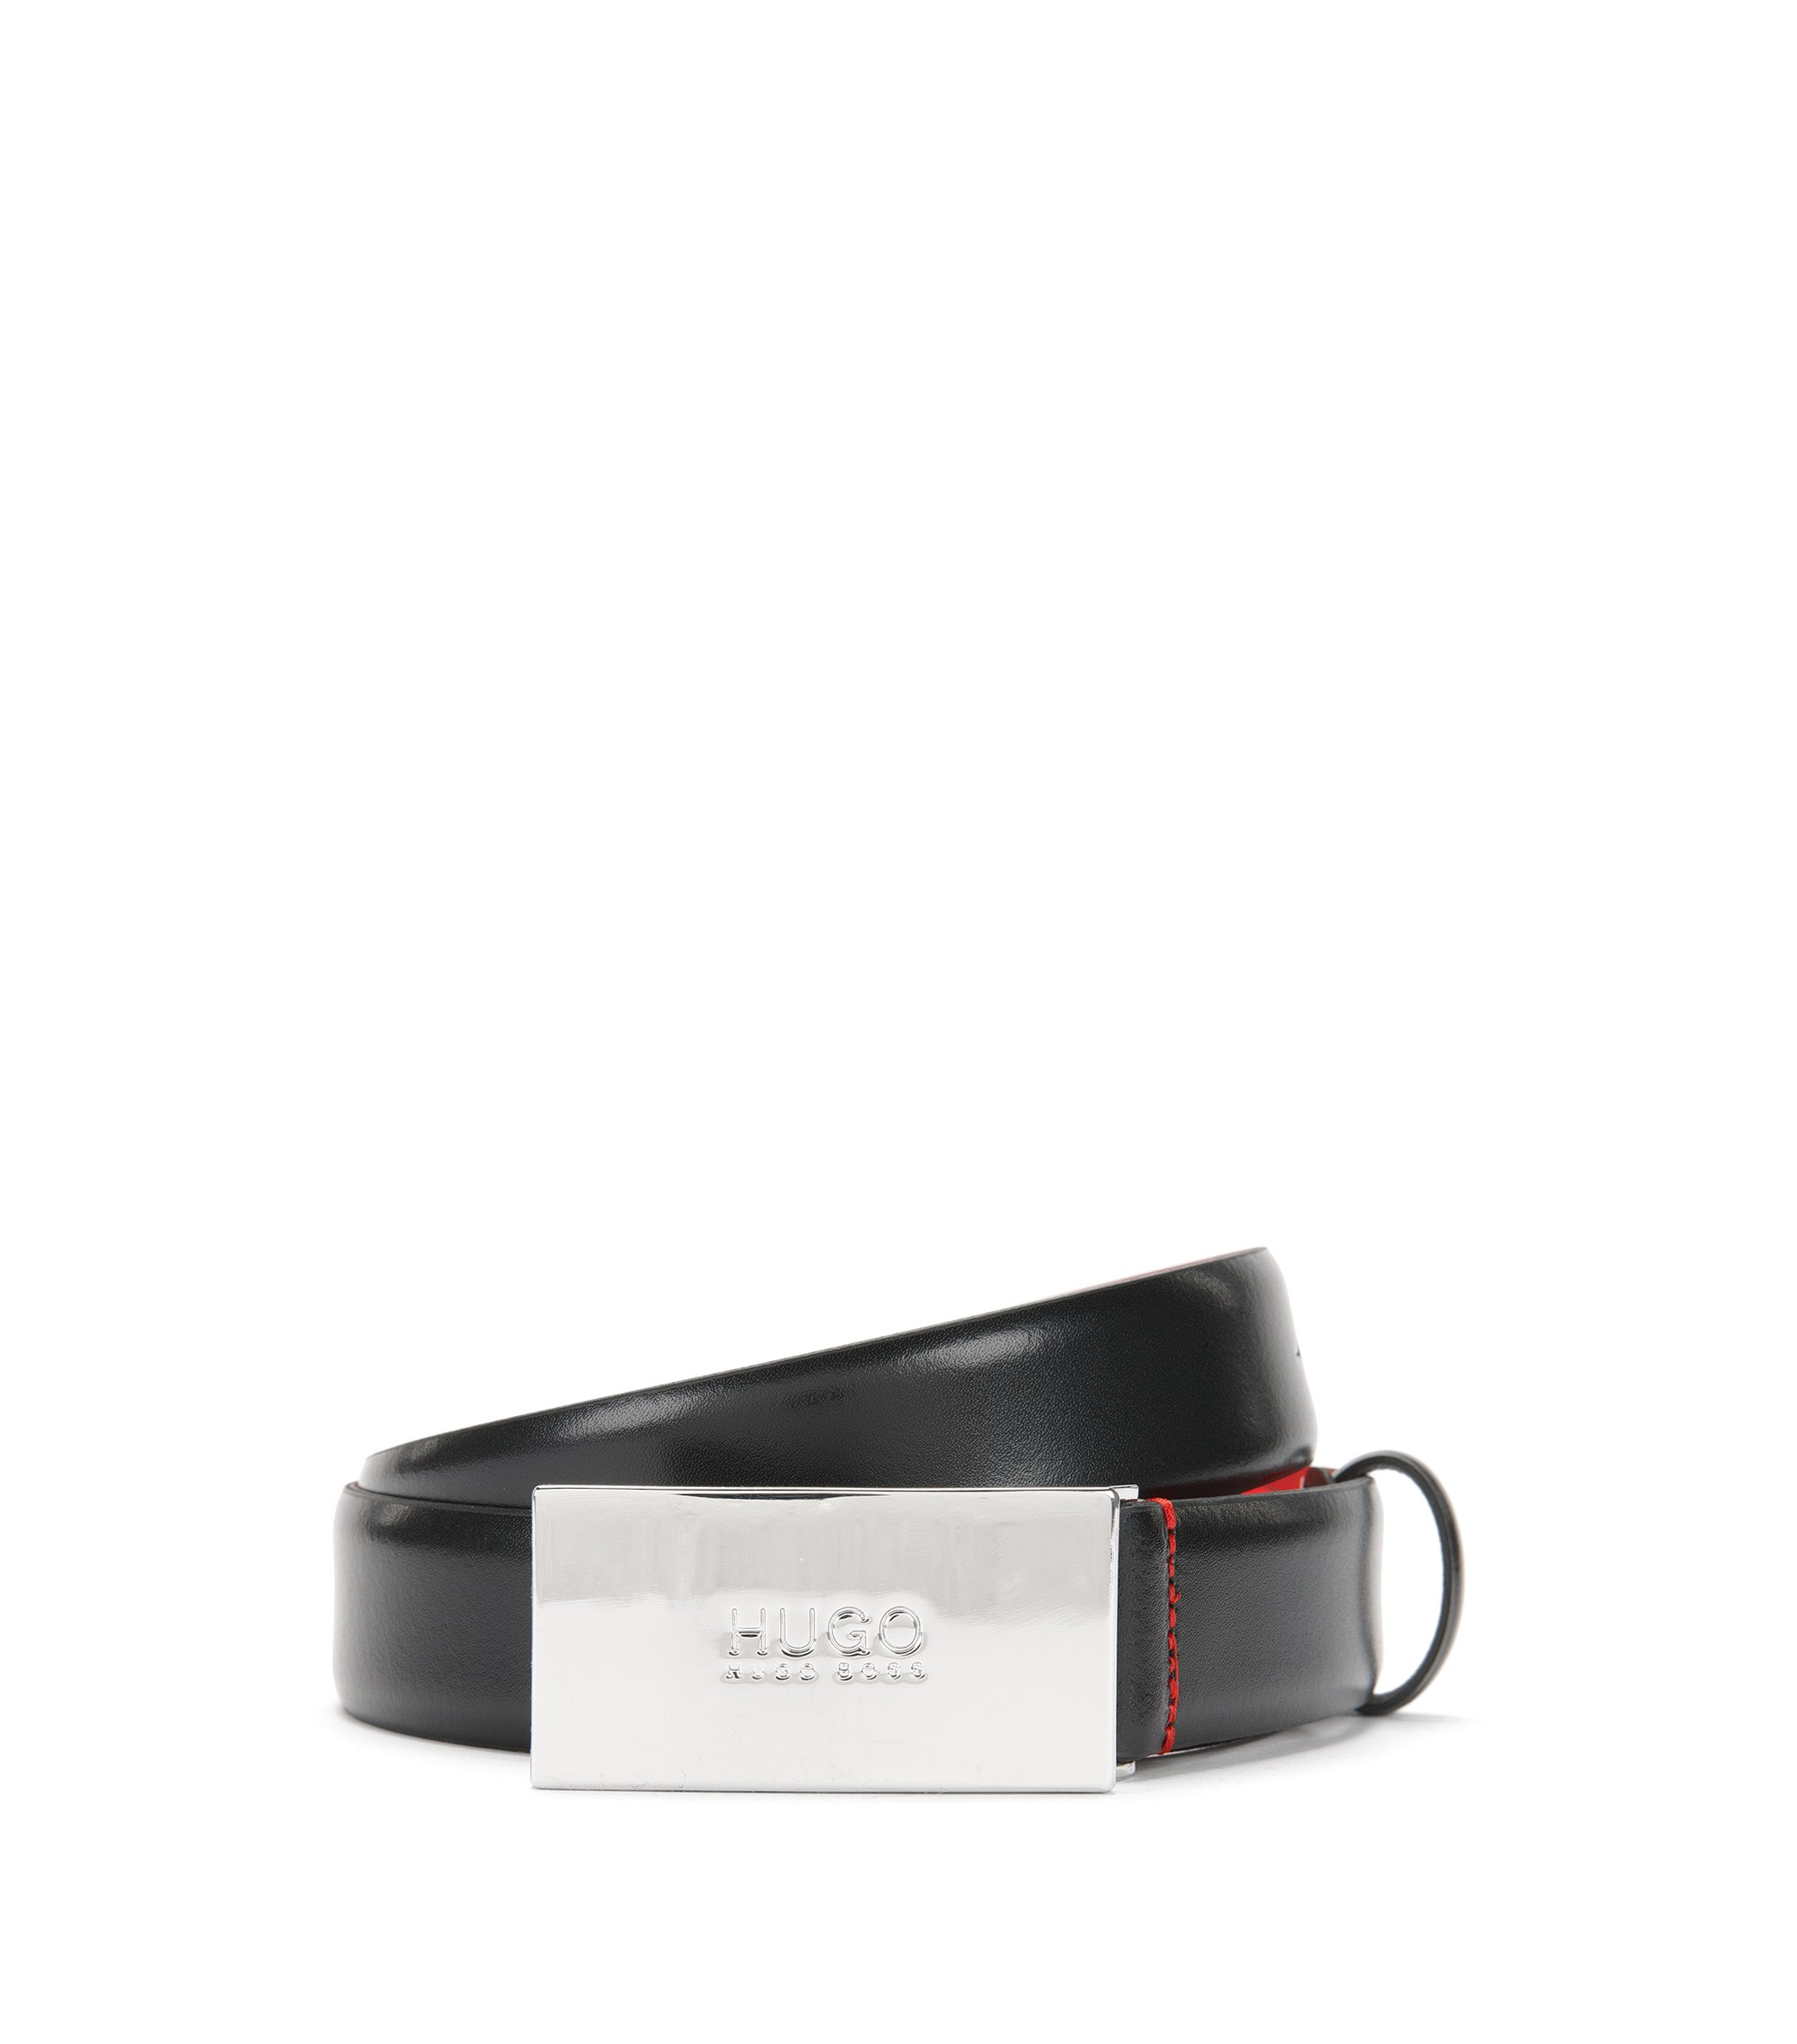 Pin Buckle Leather Belt | Baldwin N, Black